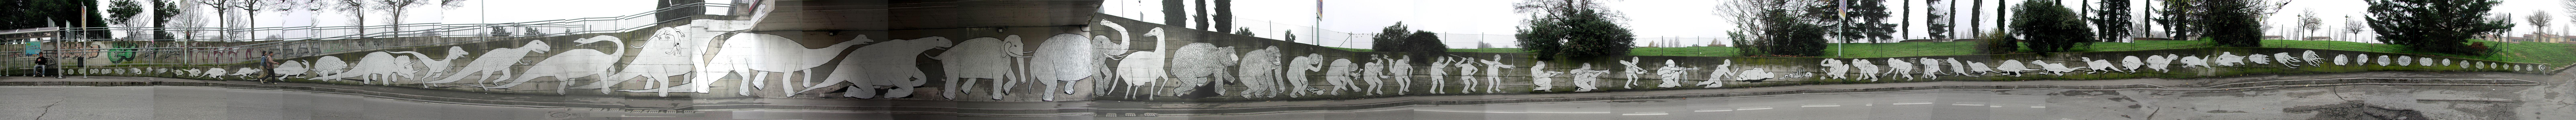 https://i2.wp.com/blublu.org/sito/walls/2007/big/046.jpg